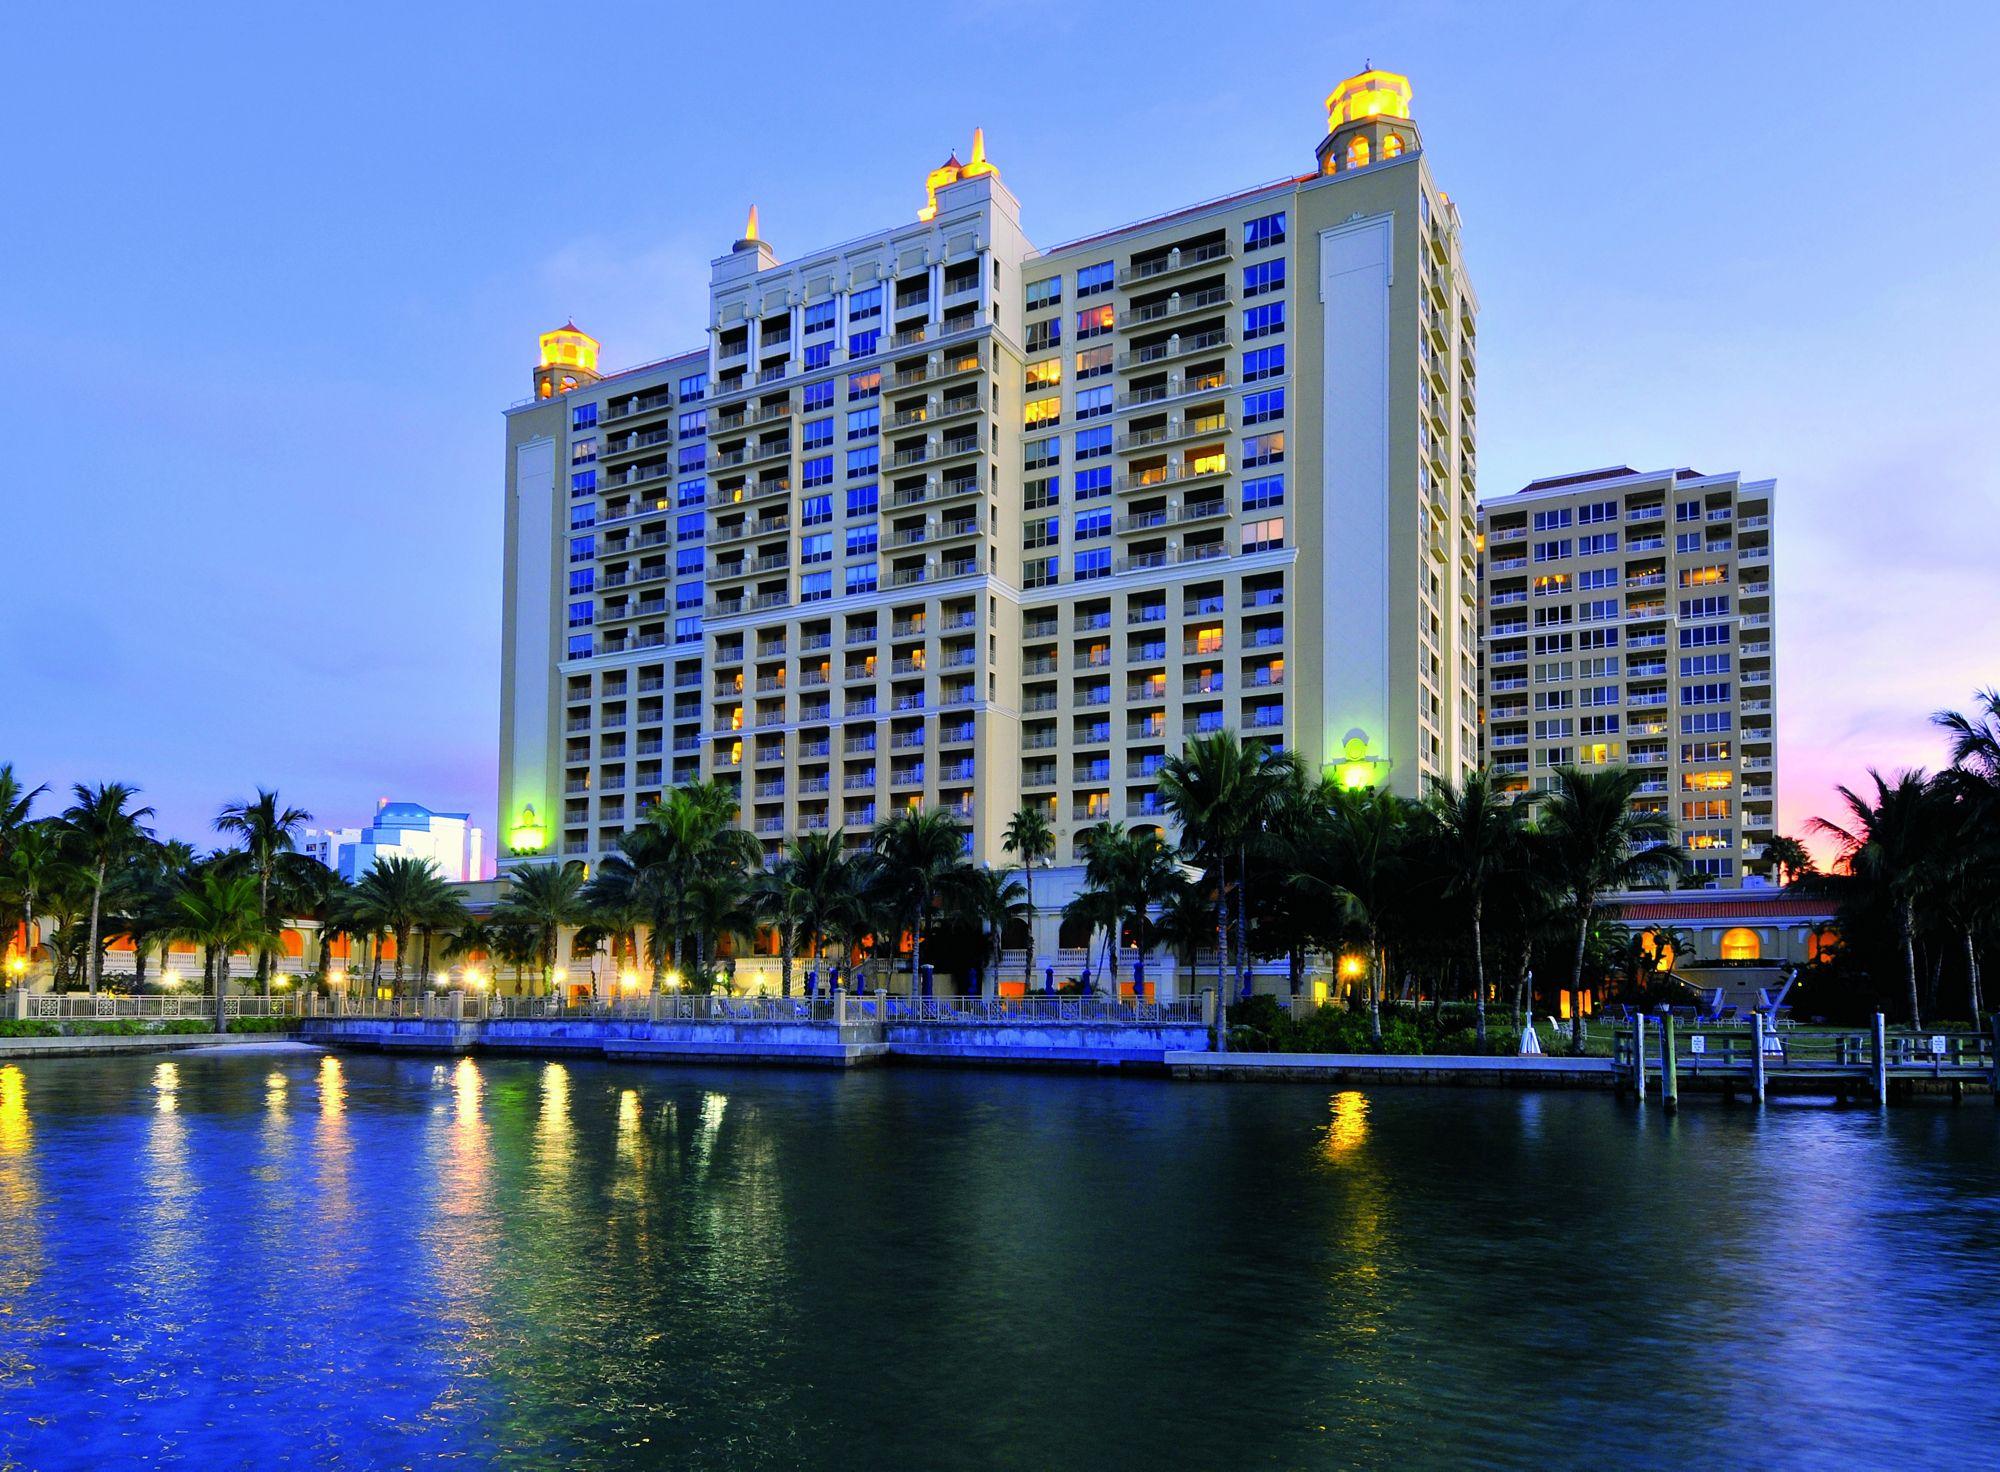 2017 FRS & FRBMA Annual Meeting - Ritz-Carlton, Sarasota 7/21/2017 – 7/23/2017